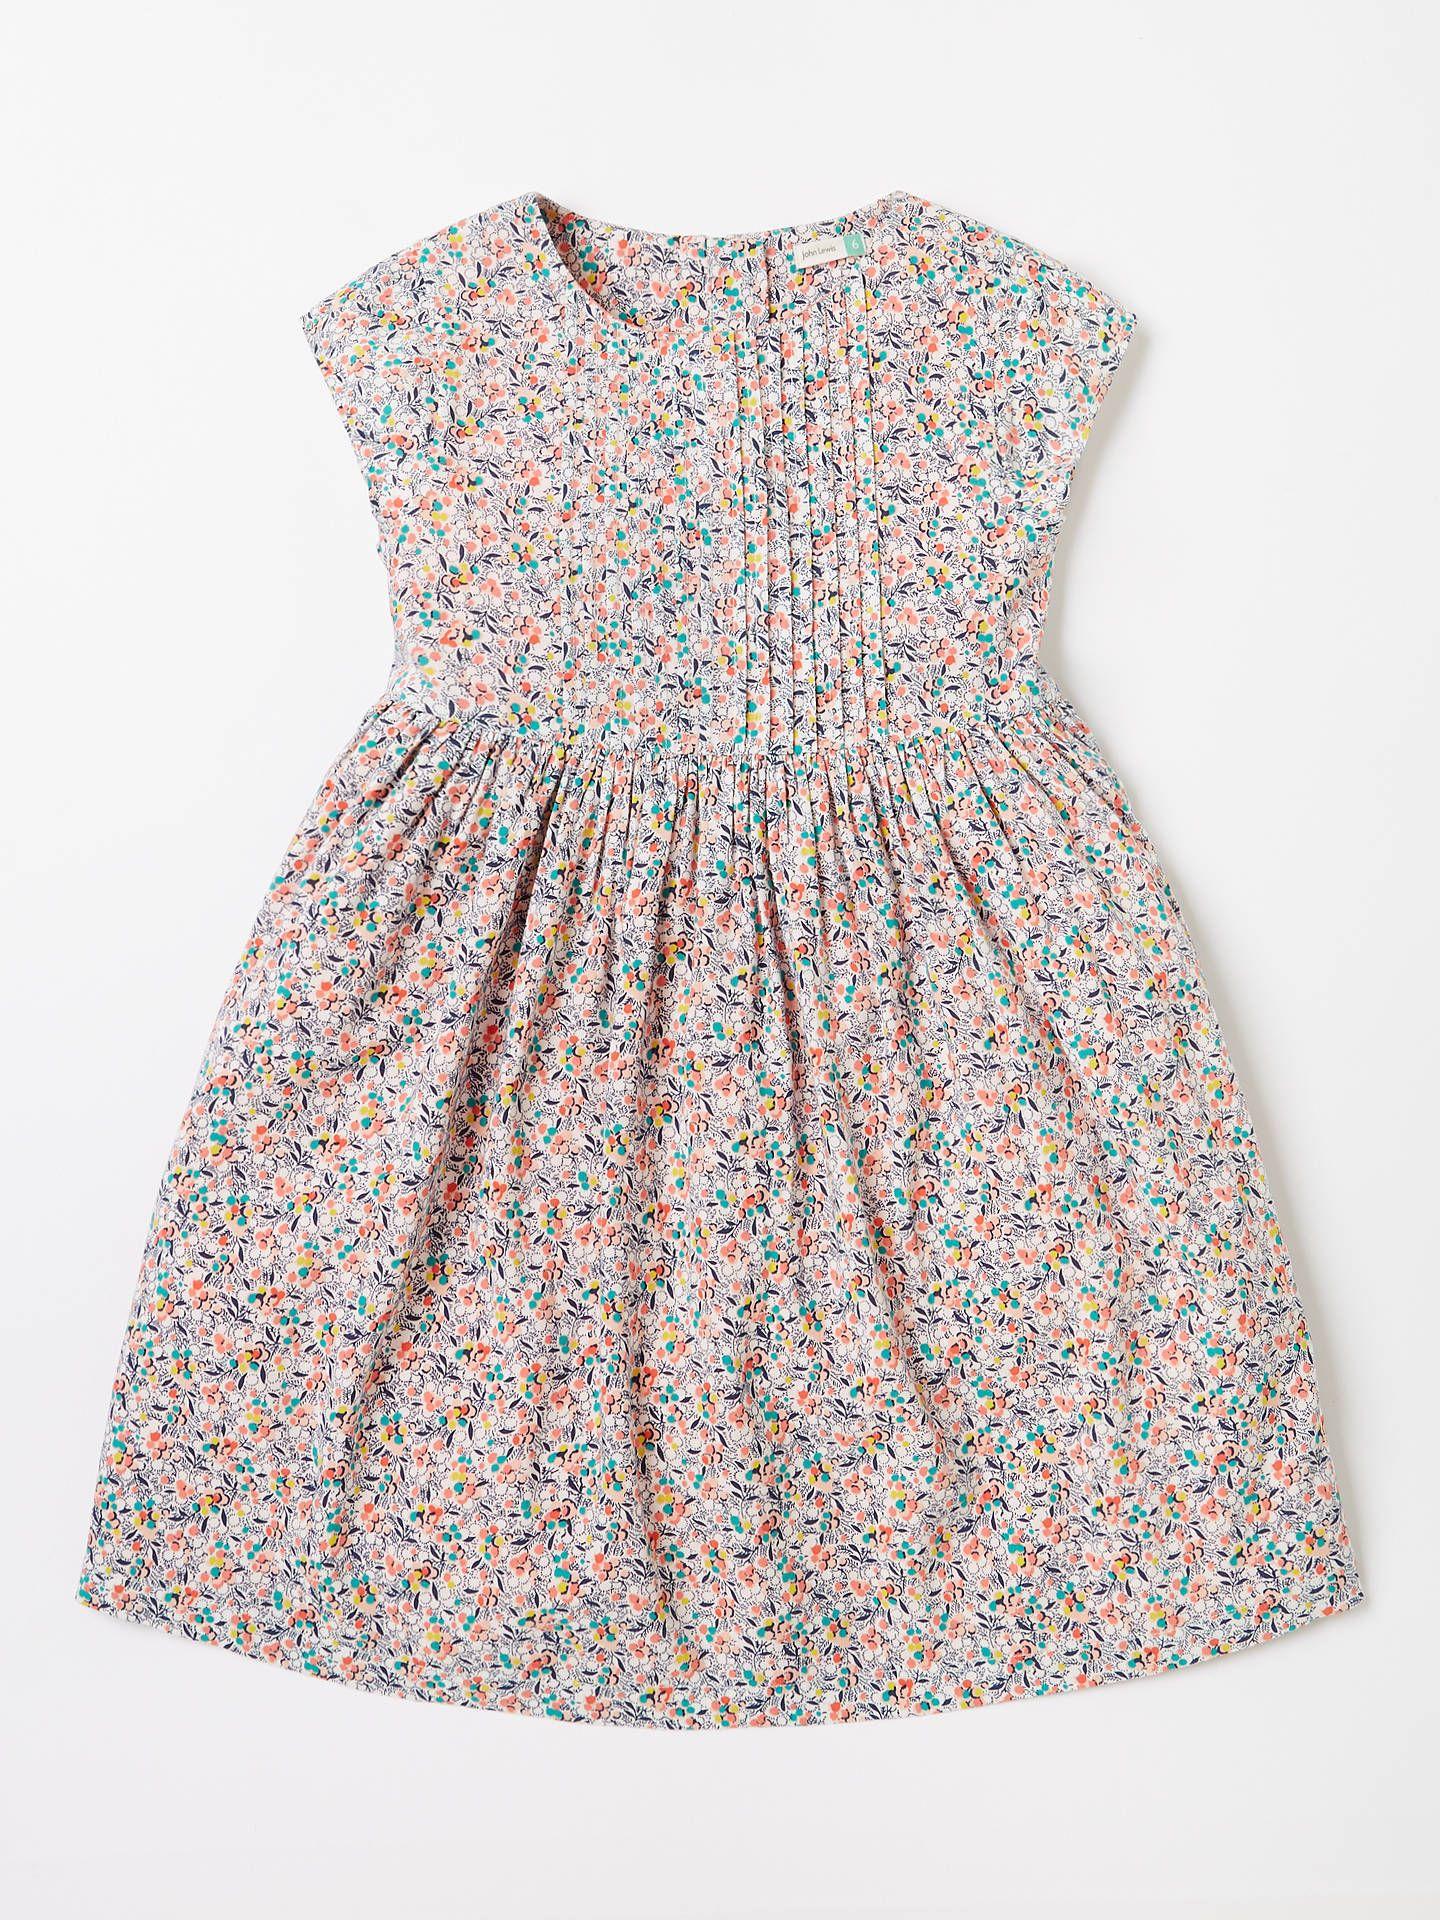 2ef5b306cd0060 John Lewis & Partners Girls' Ditsy Floral Print Dress, Multi at John Lewis  & Partners